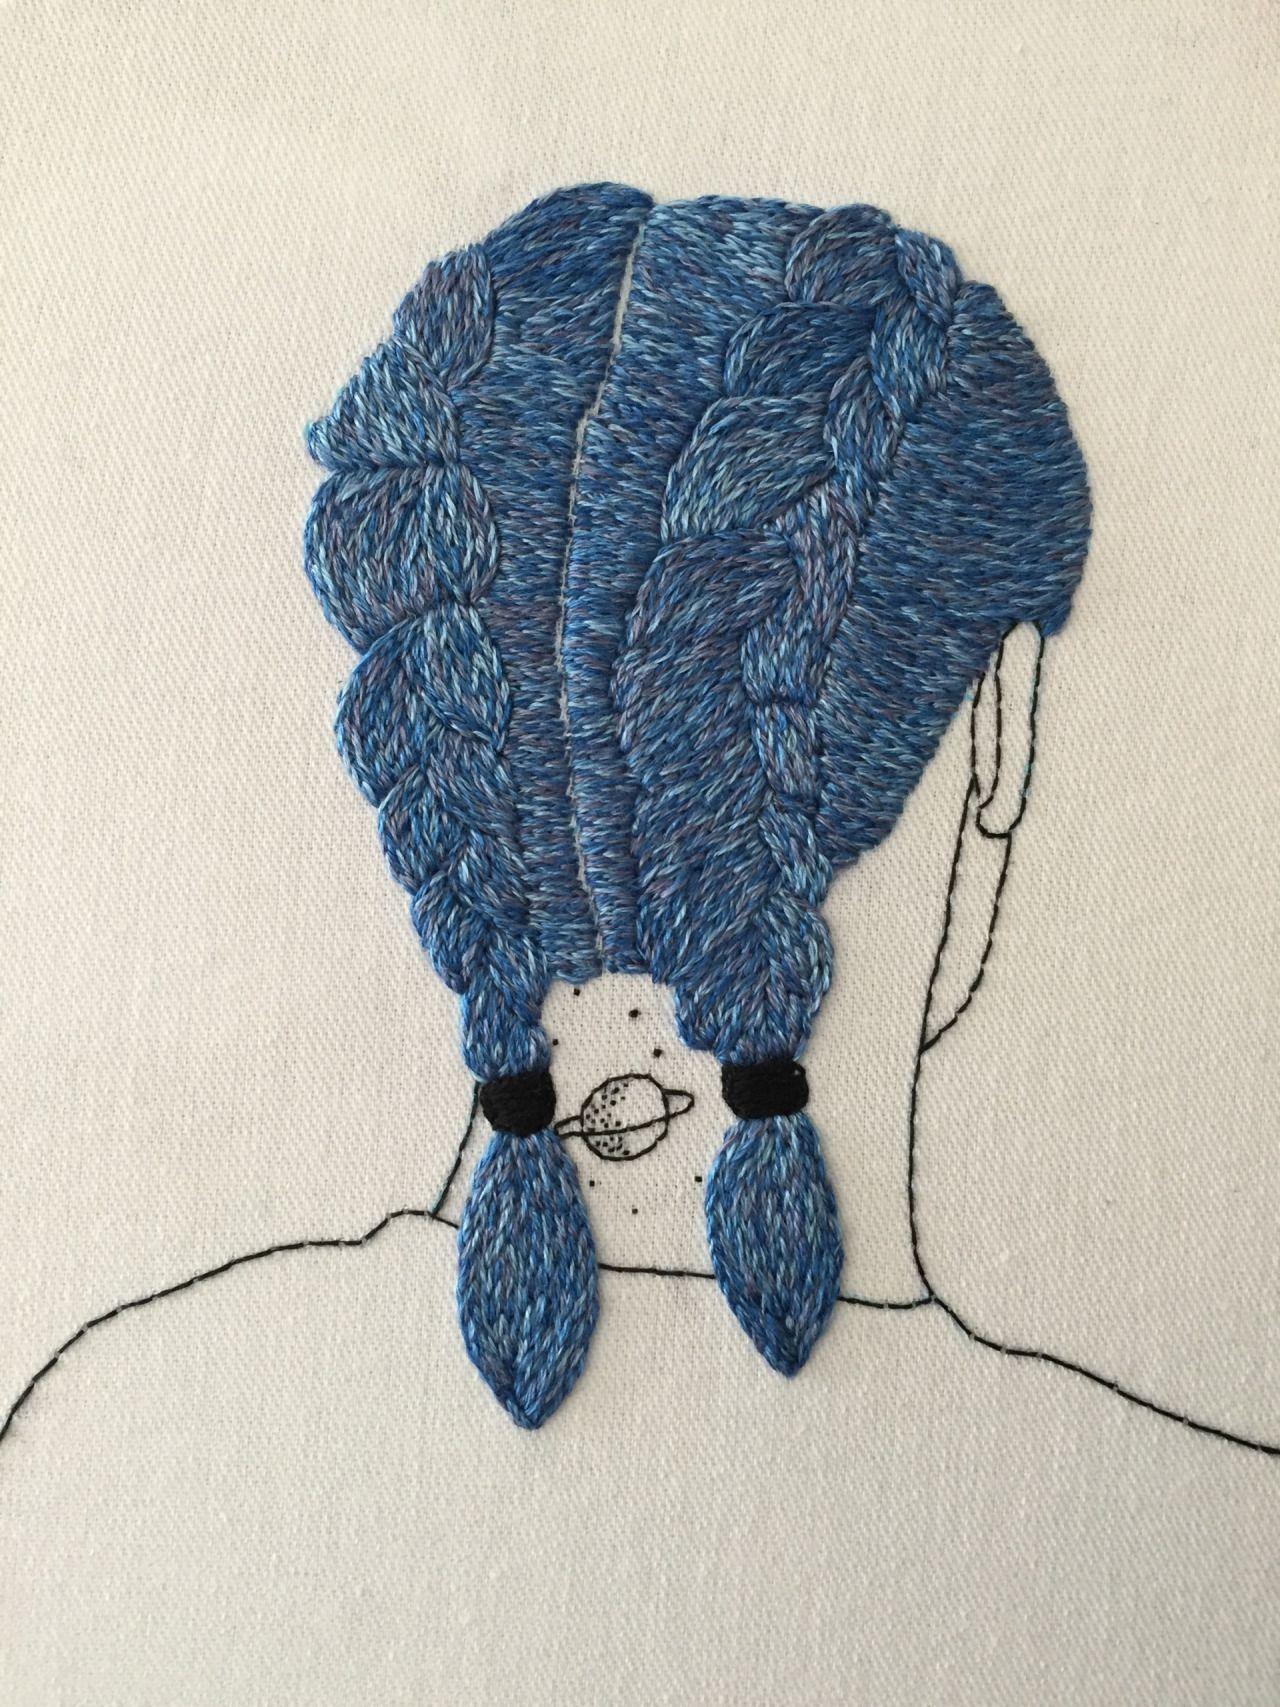 Modern embroidery by Querida Sputnik.